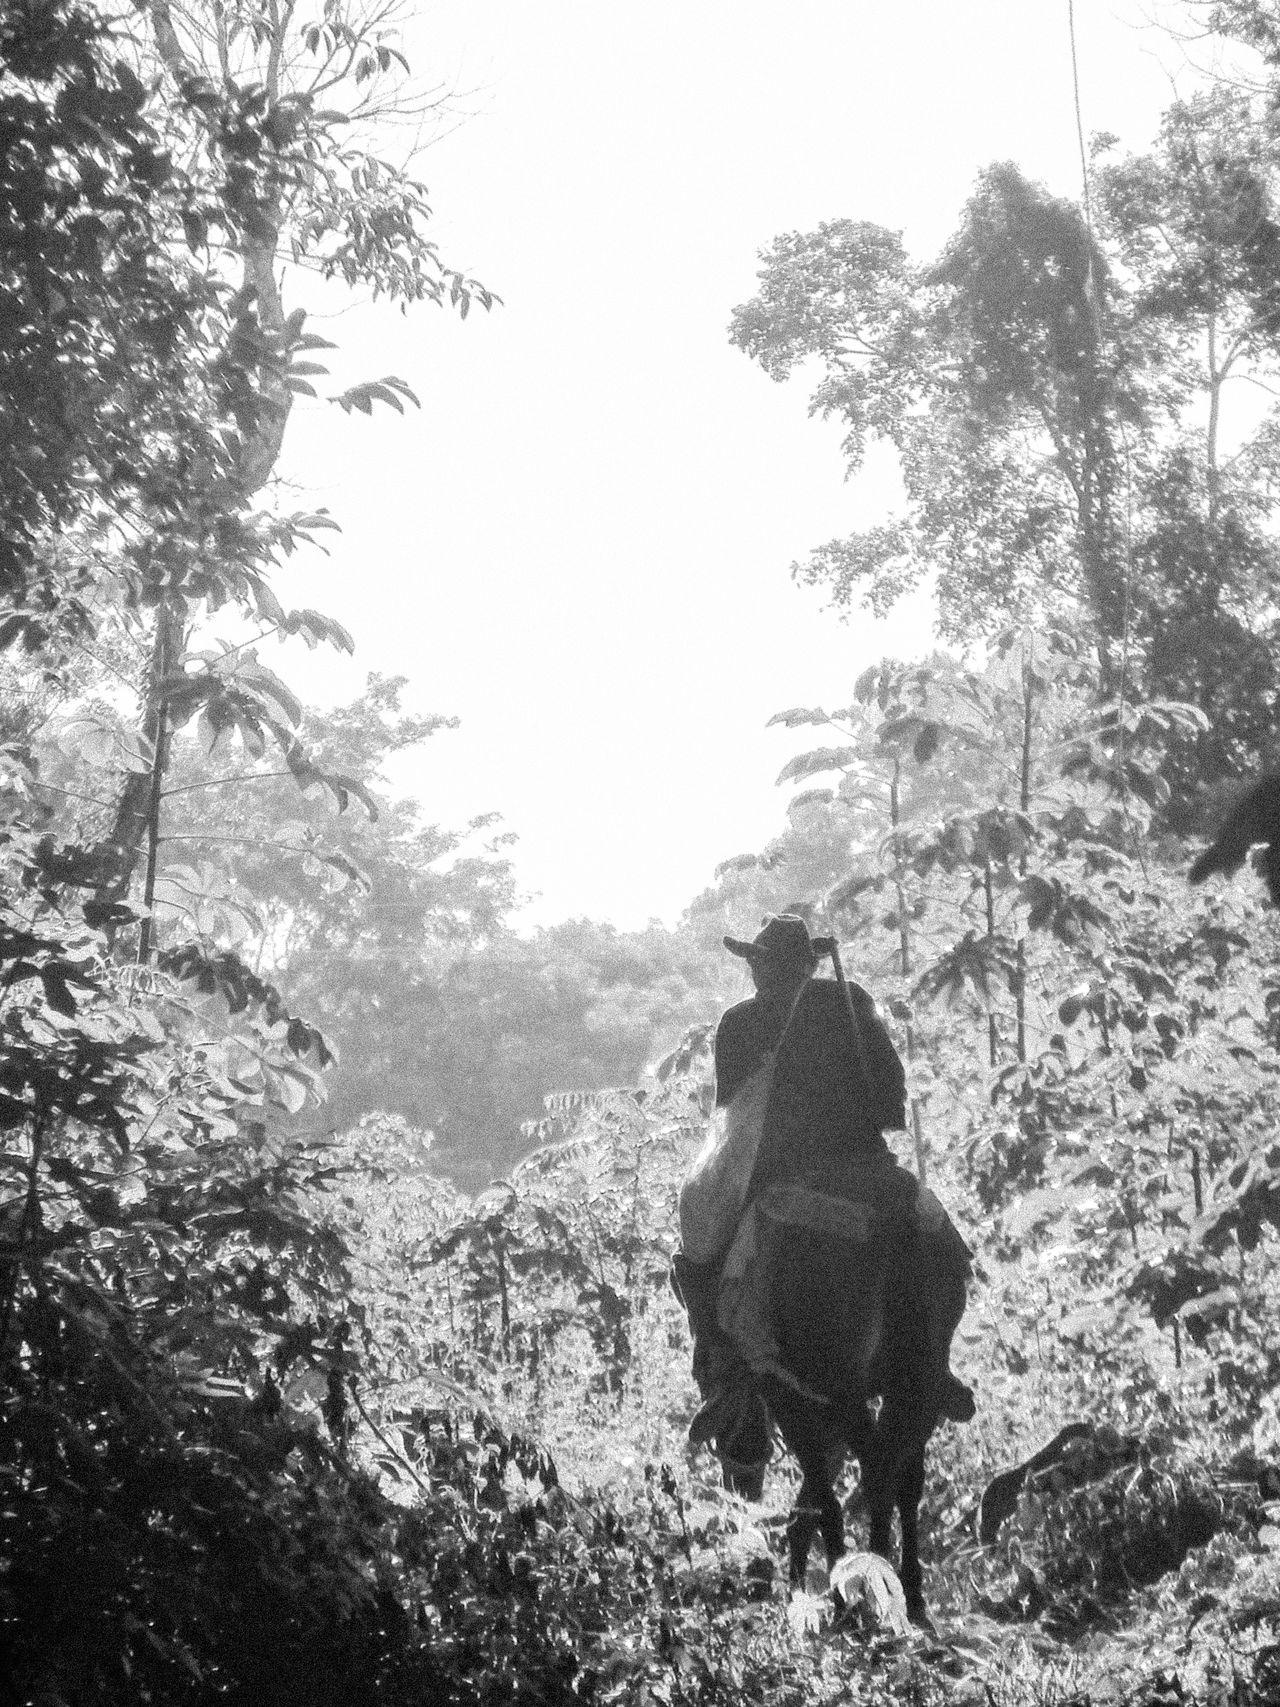 Black And White Day Forest Forest Trail Horse Lone Rider Man On Horseback Non-urban Scene Rainforest Remote Solitude Tropical Rainforest Yucatan Mexico Yucatan Peninsula Yúcatan Hunter